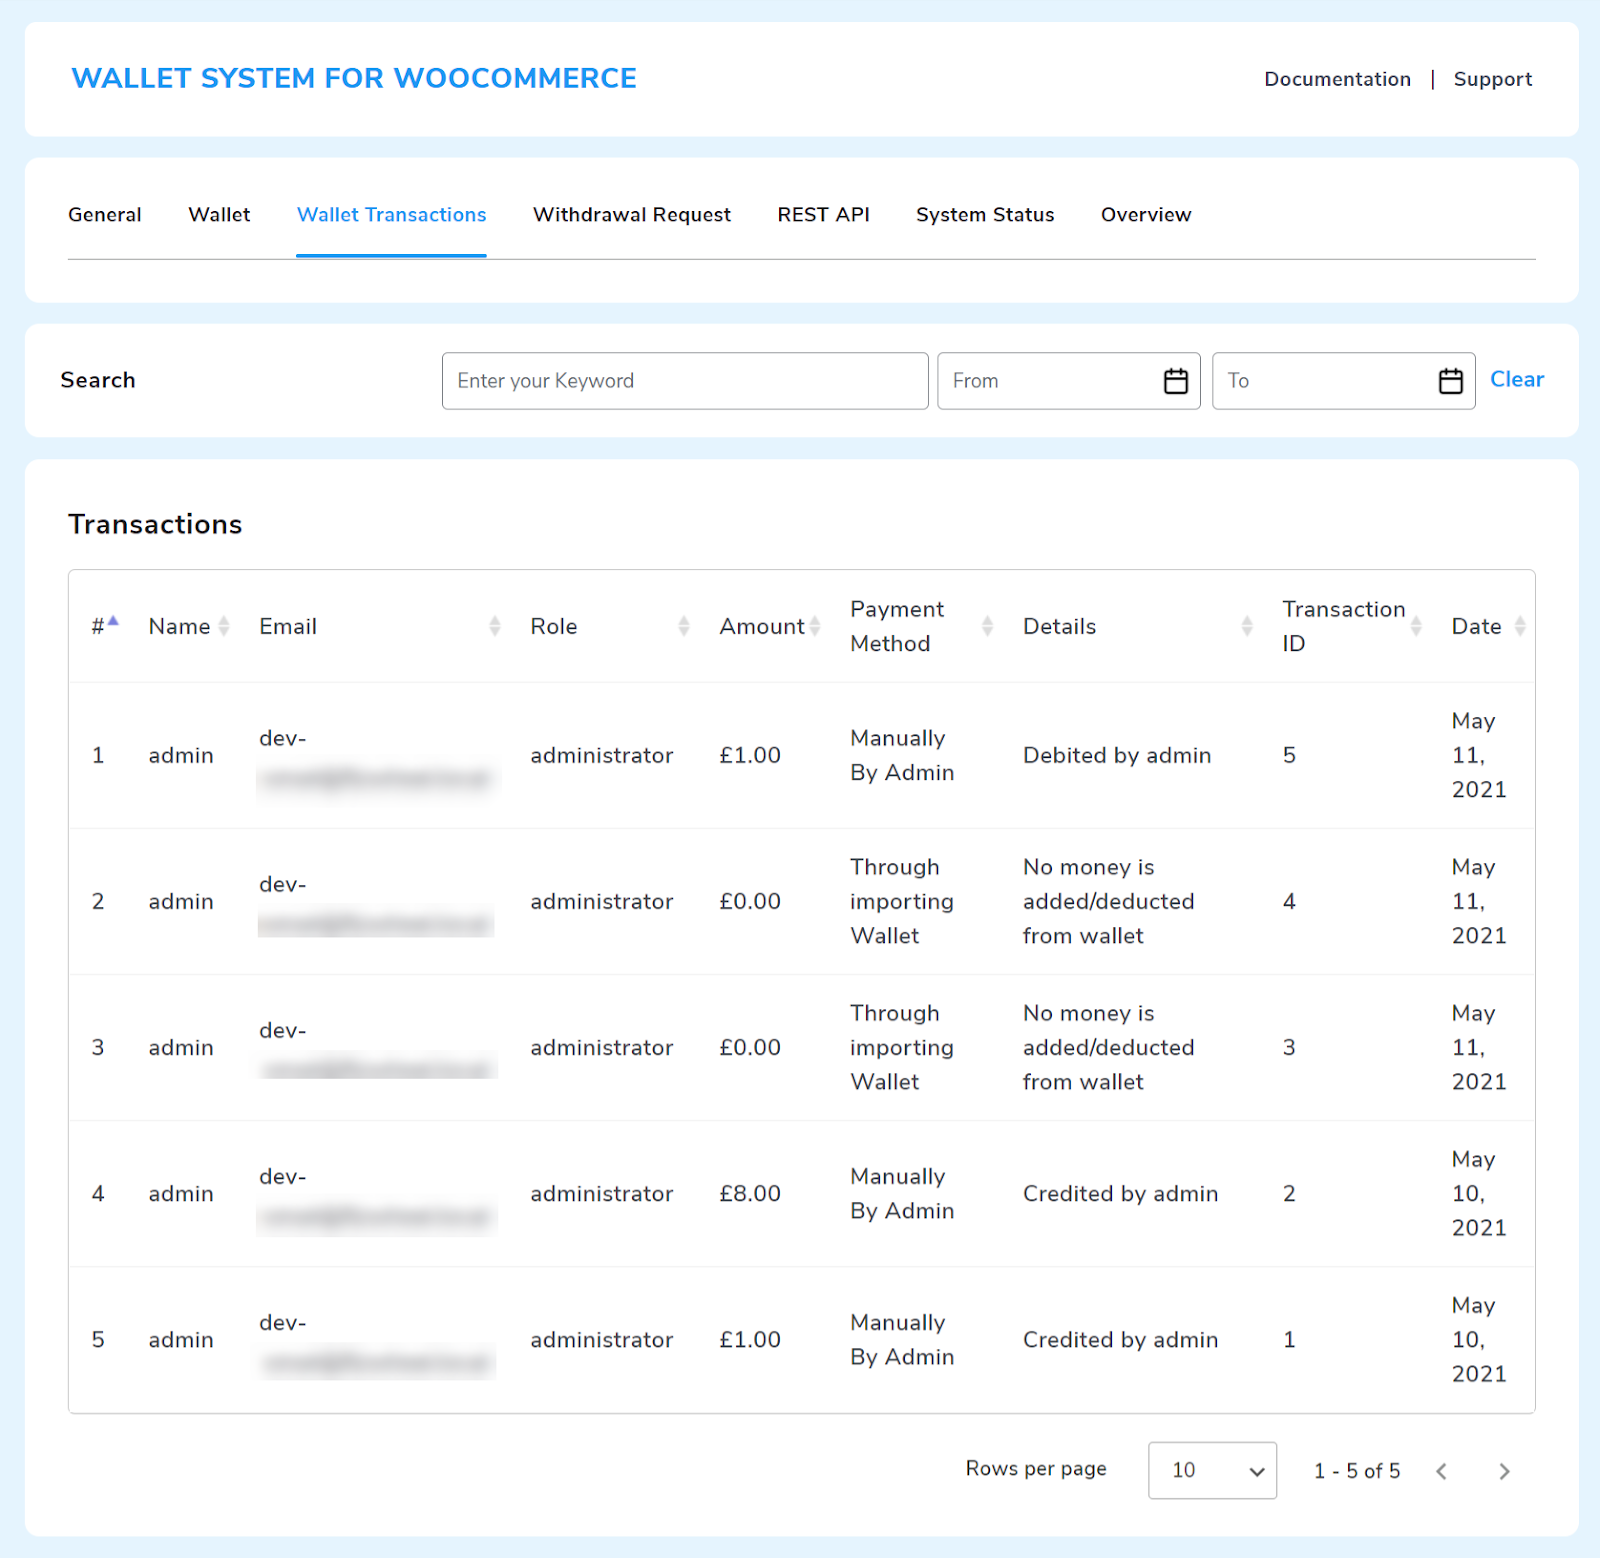 Wallet Transactions setting